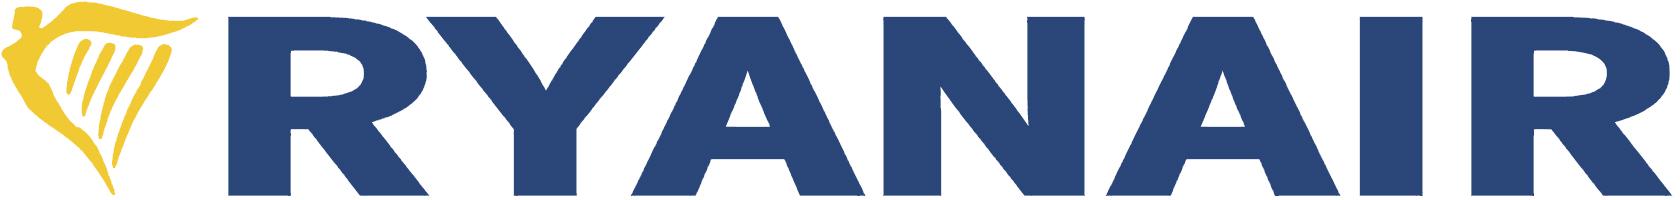 Ryanair logo clipart freeuse download Ryanair – Logos Download freeuse download